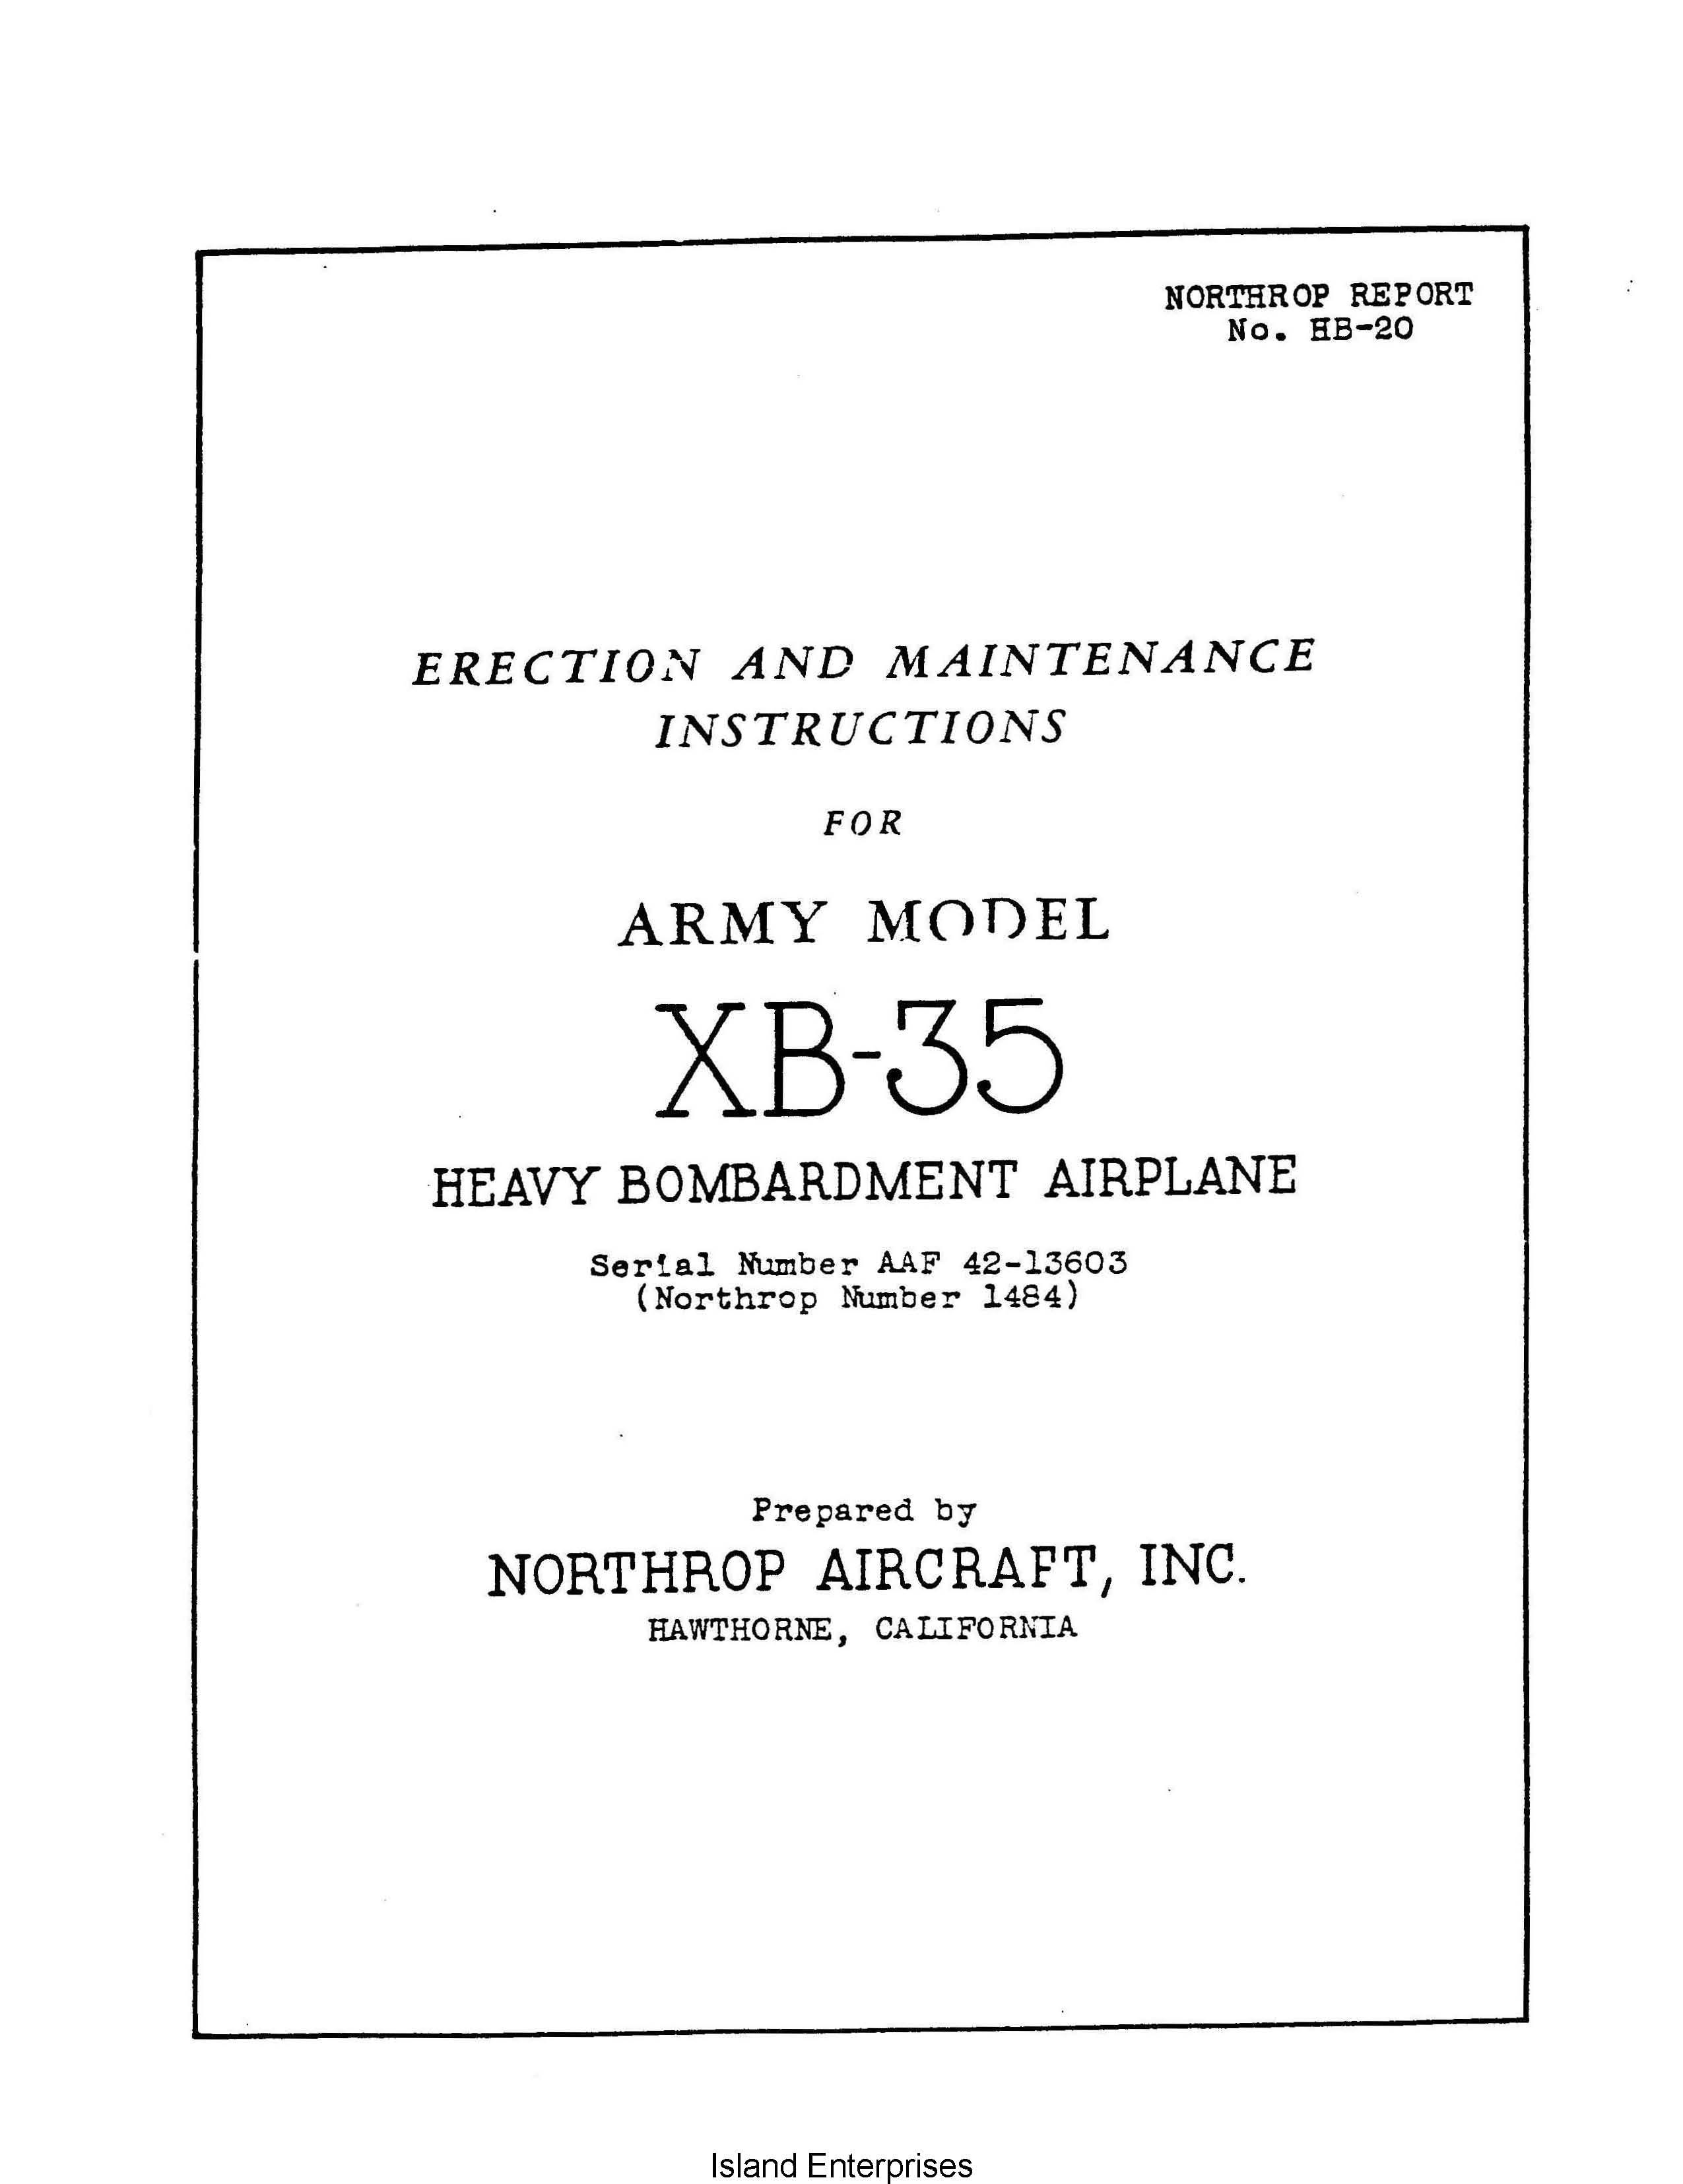 northrop xb 35 heavy bombardment airplane erection